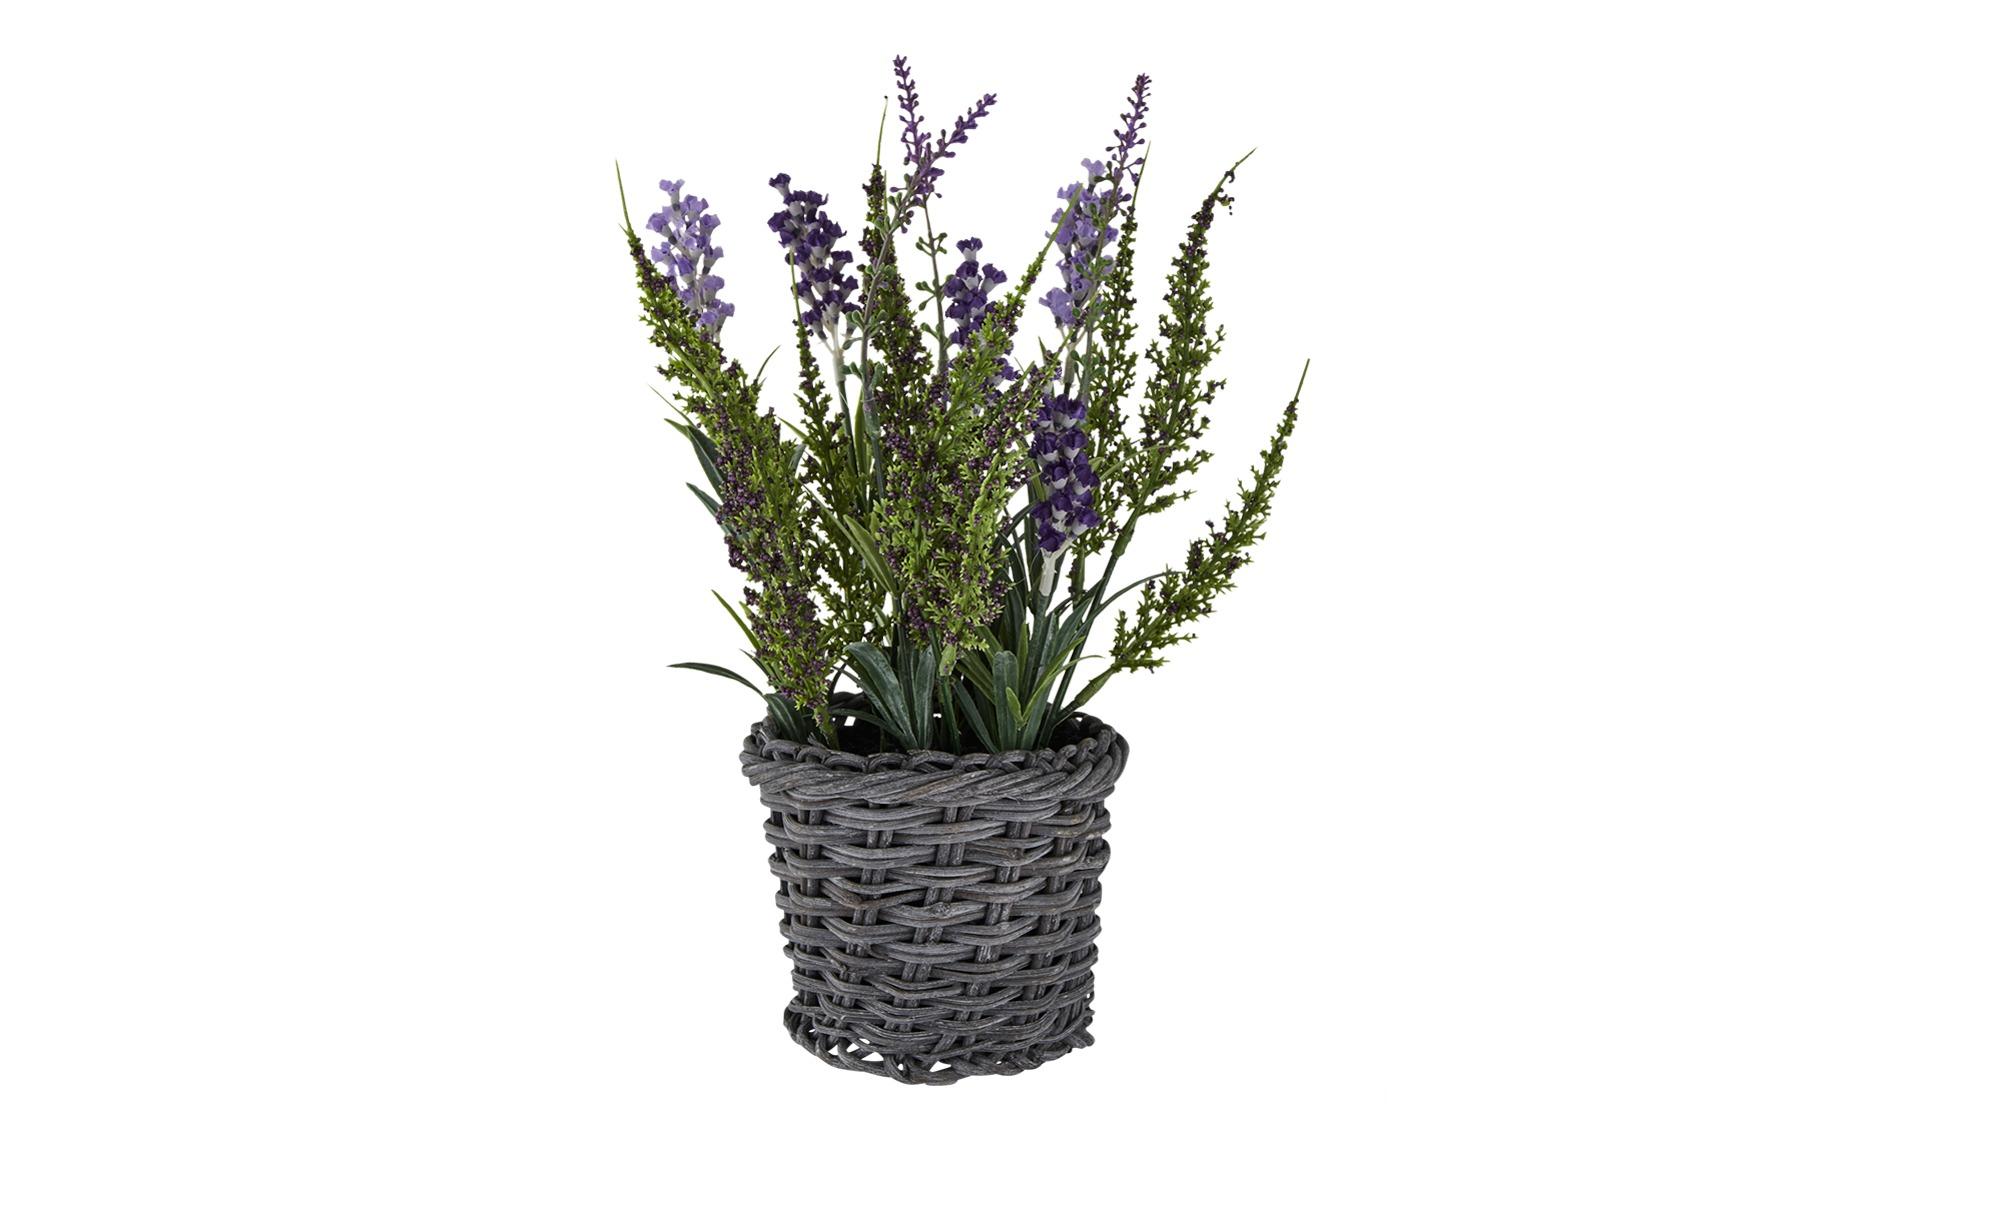 Lavendel im Korb - lila/violett - Rattan, Kunststoff - 30 cm - Dekoration > Kunstblumen - Möbel Kraft